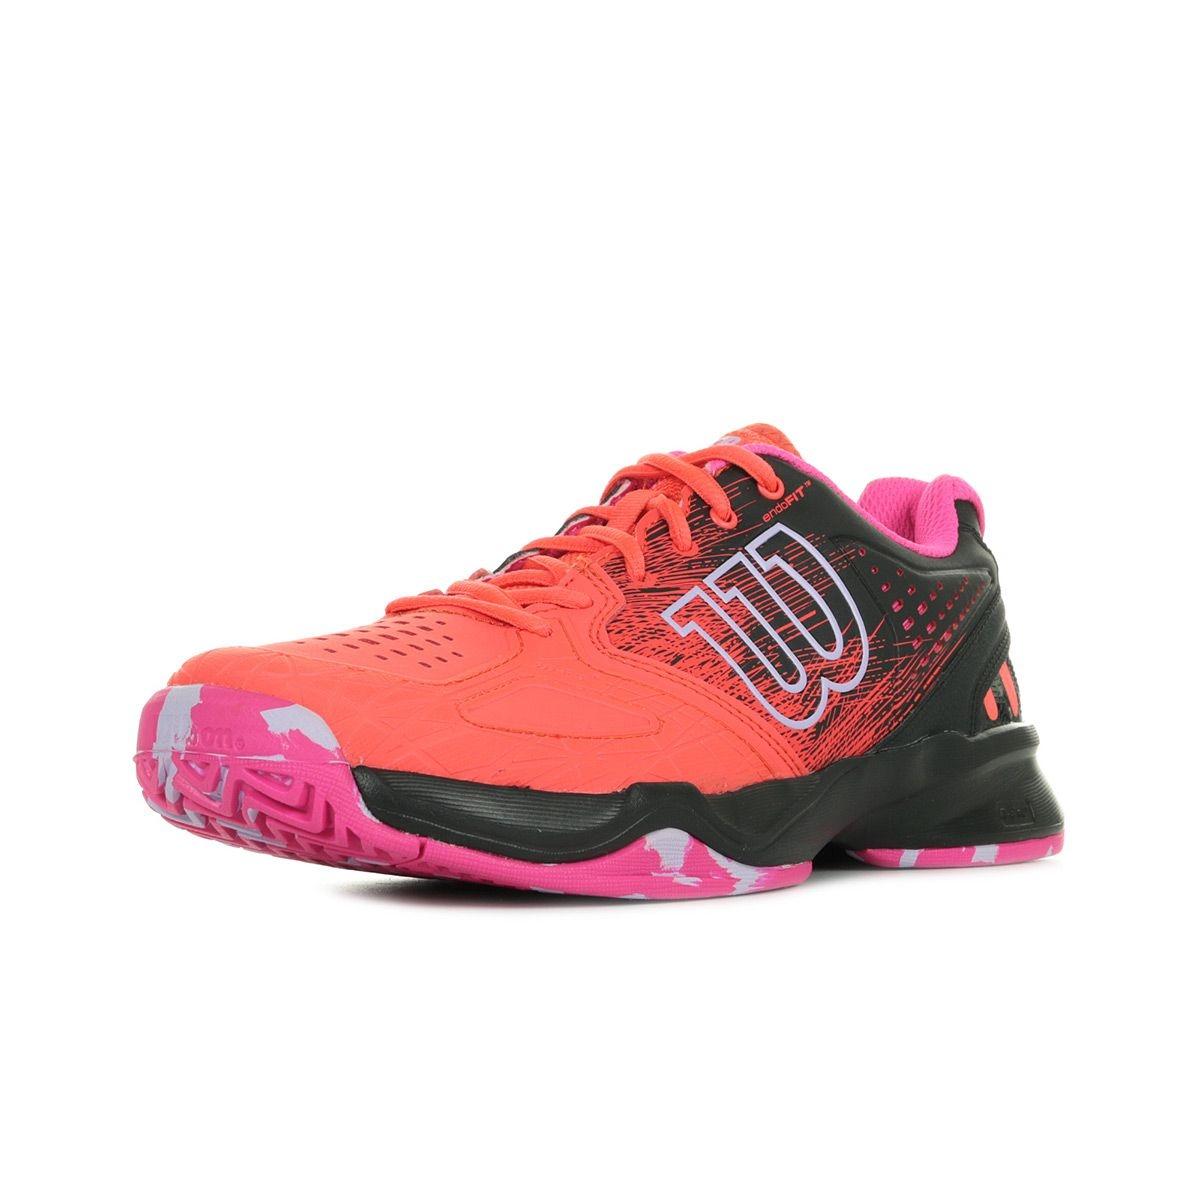 Chaussures de tennis Kaos Comp Wn's